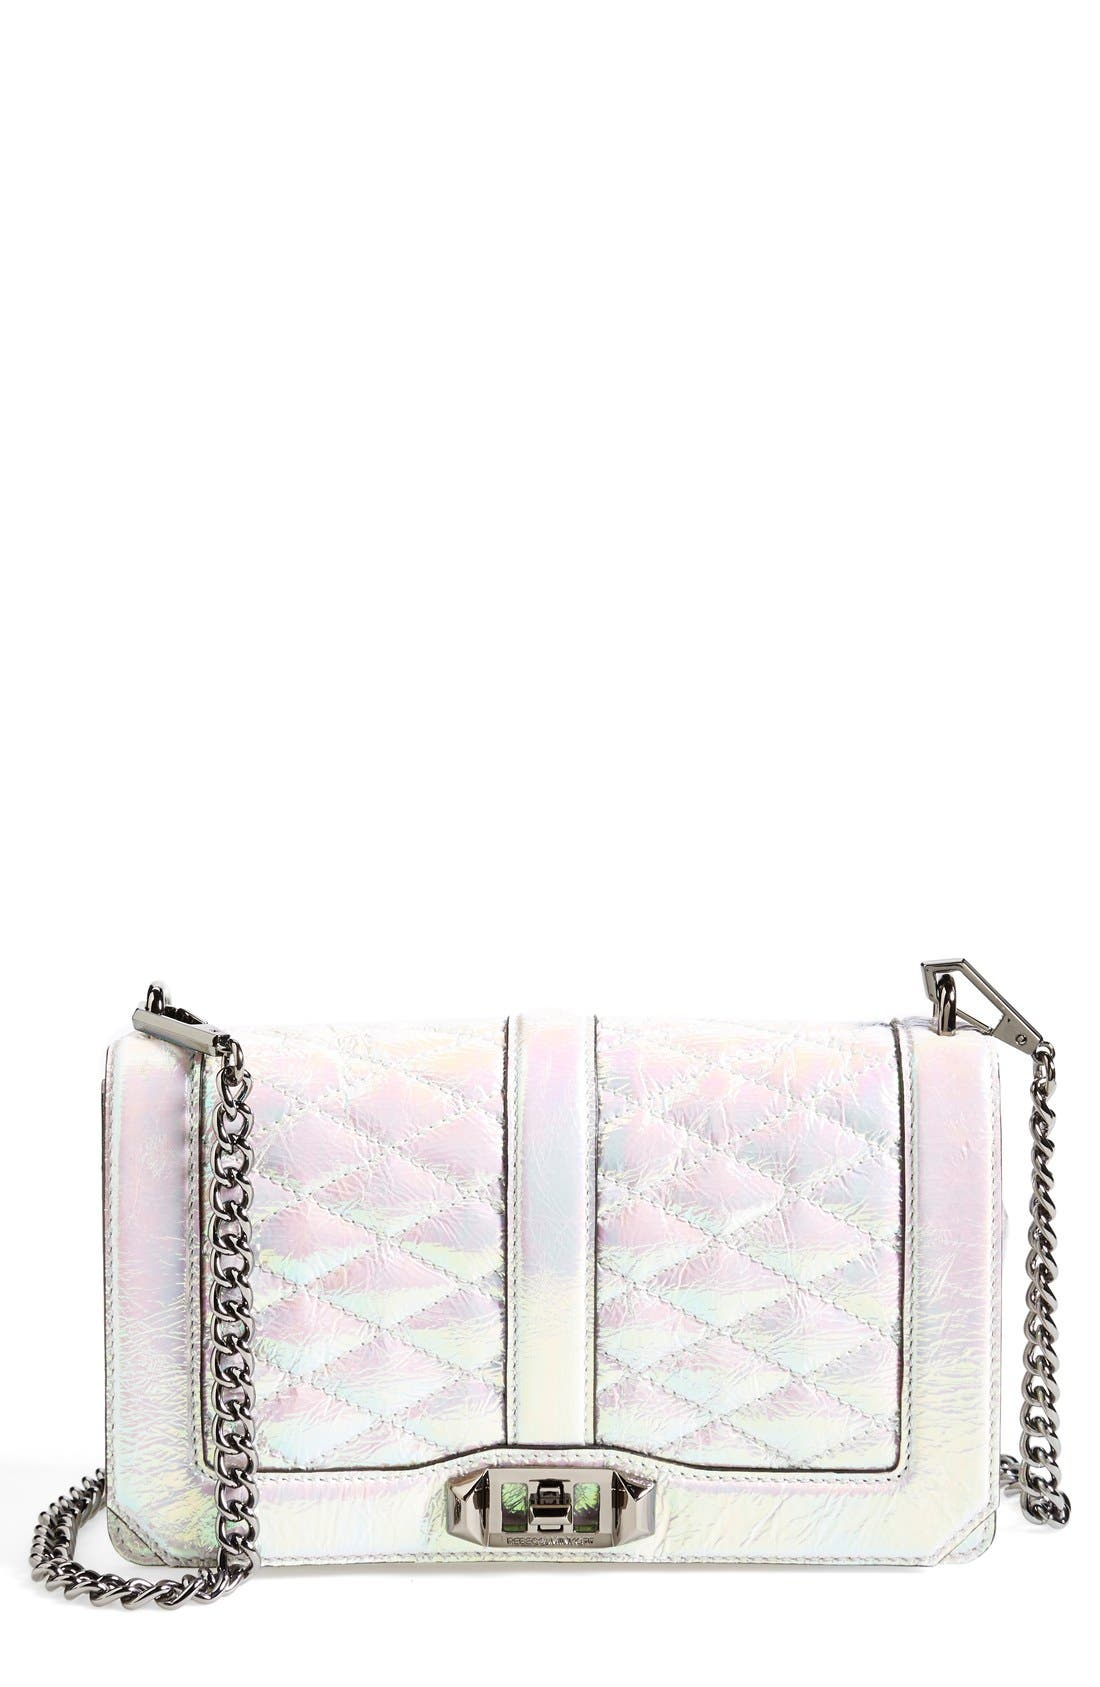 Alternate Image 1 Selected - Rebecca Minkoff 'Love' Crossbody Bag